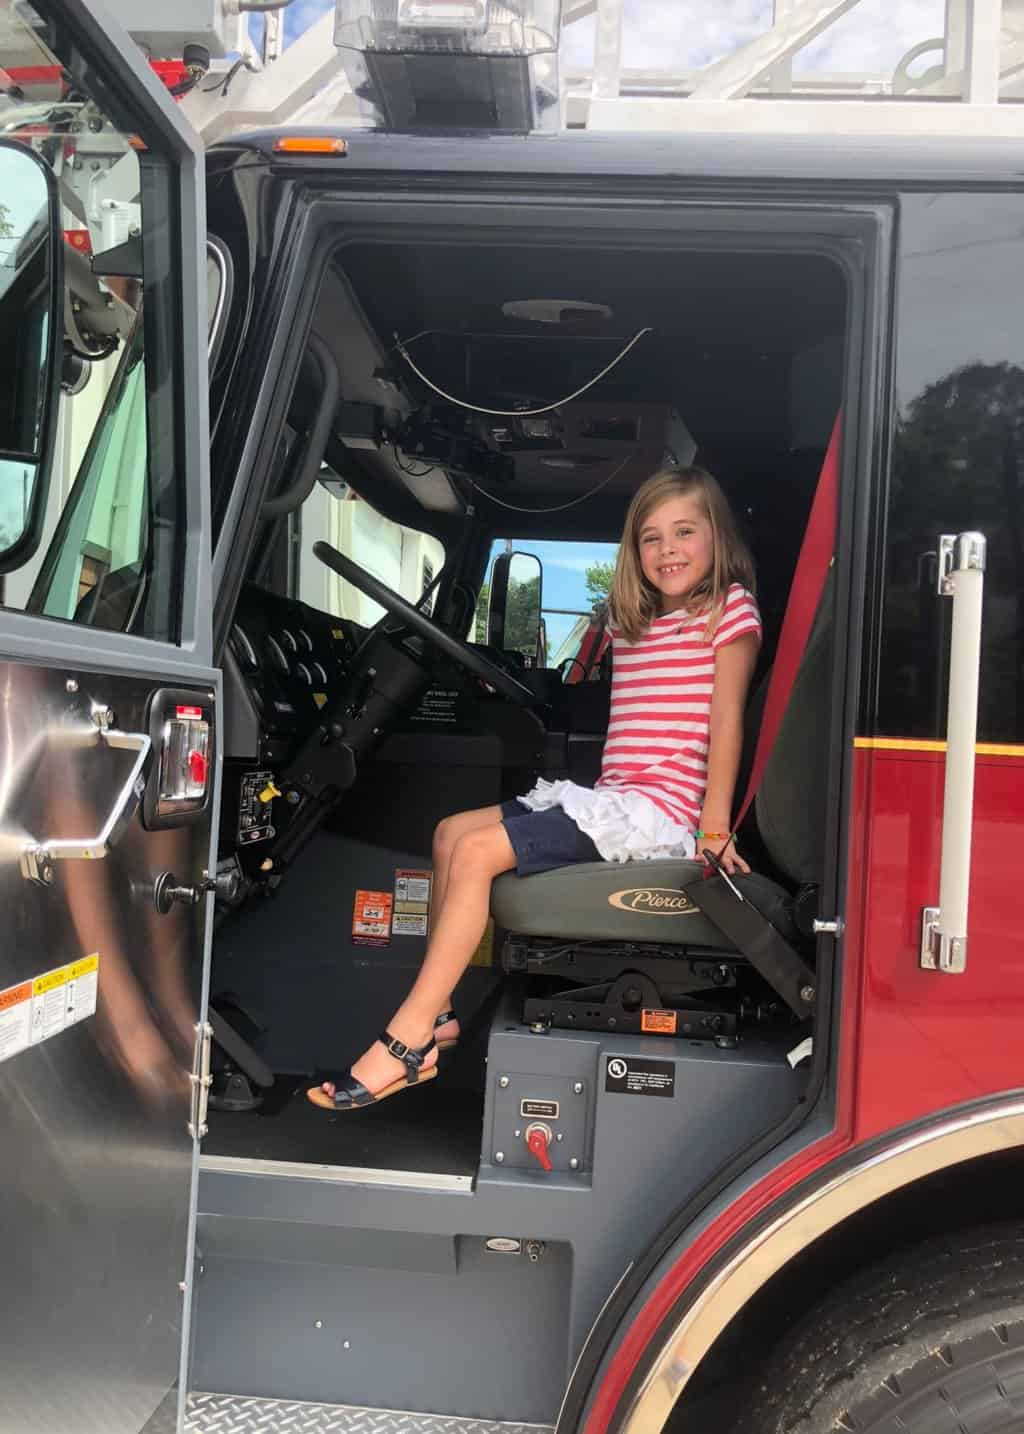 firestation fire safety visit